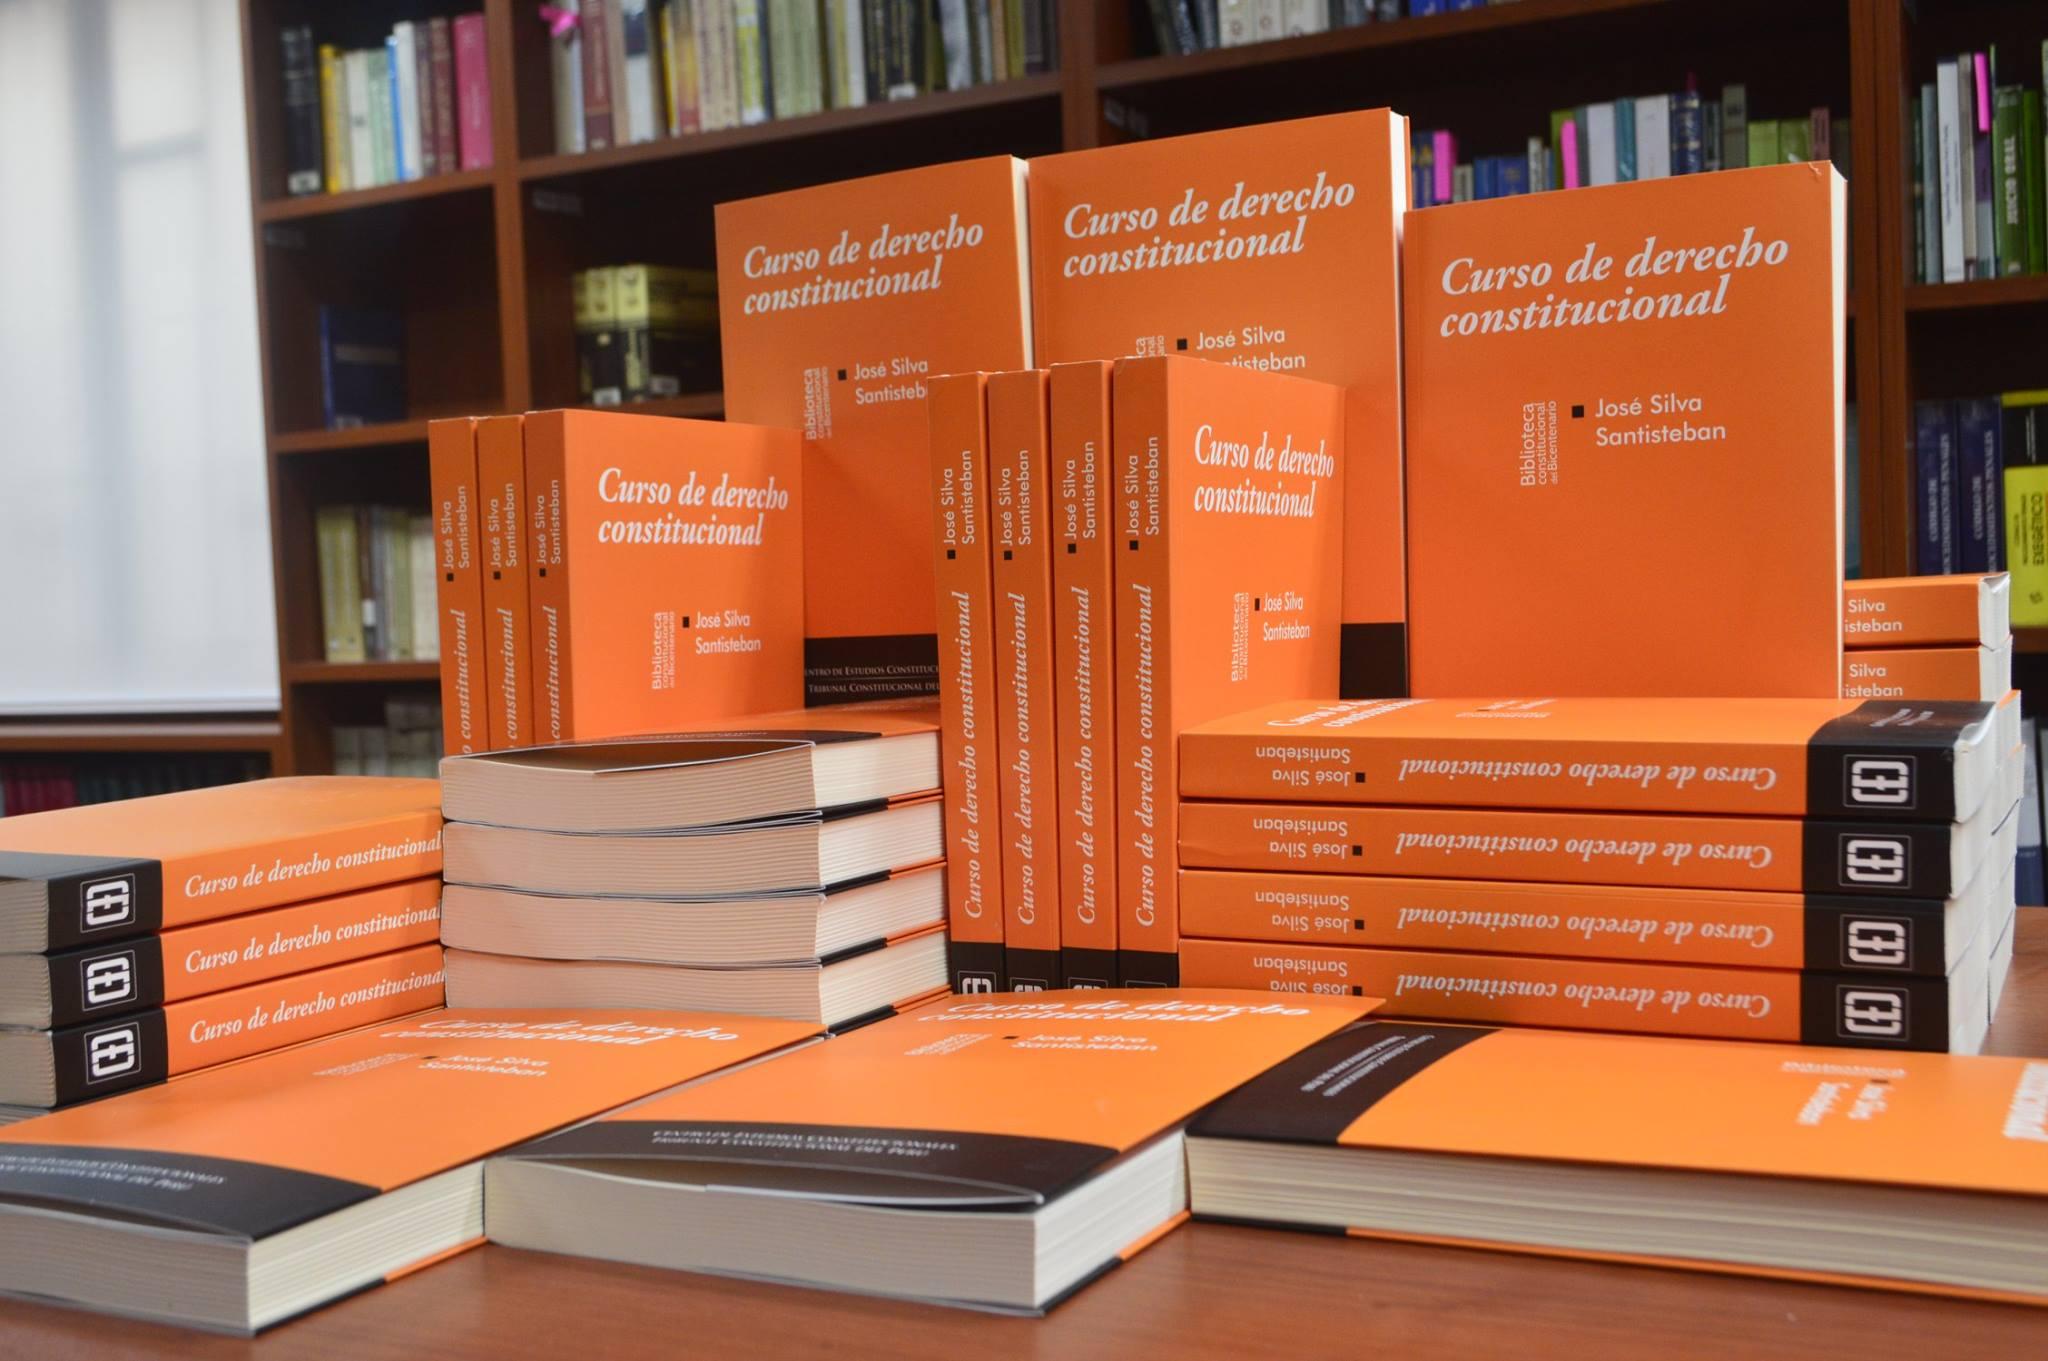 Curso de derecho constitucional - José Silva Santisteban